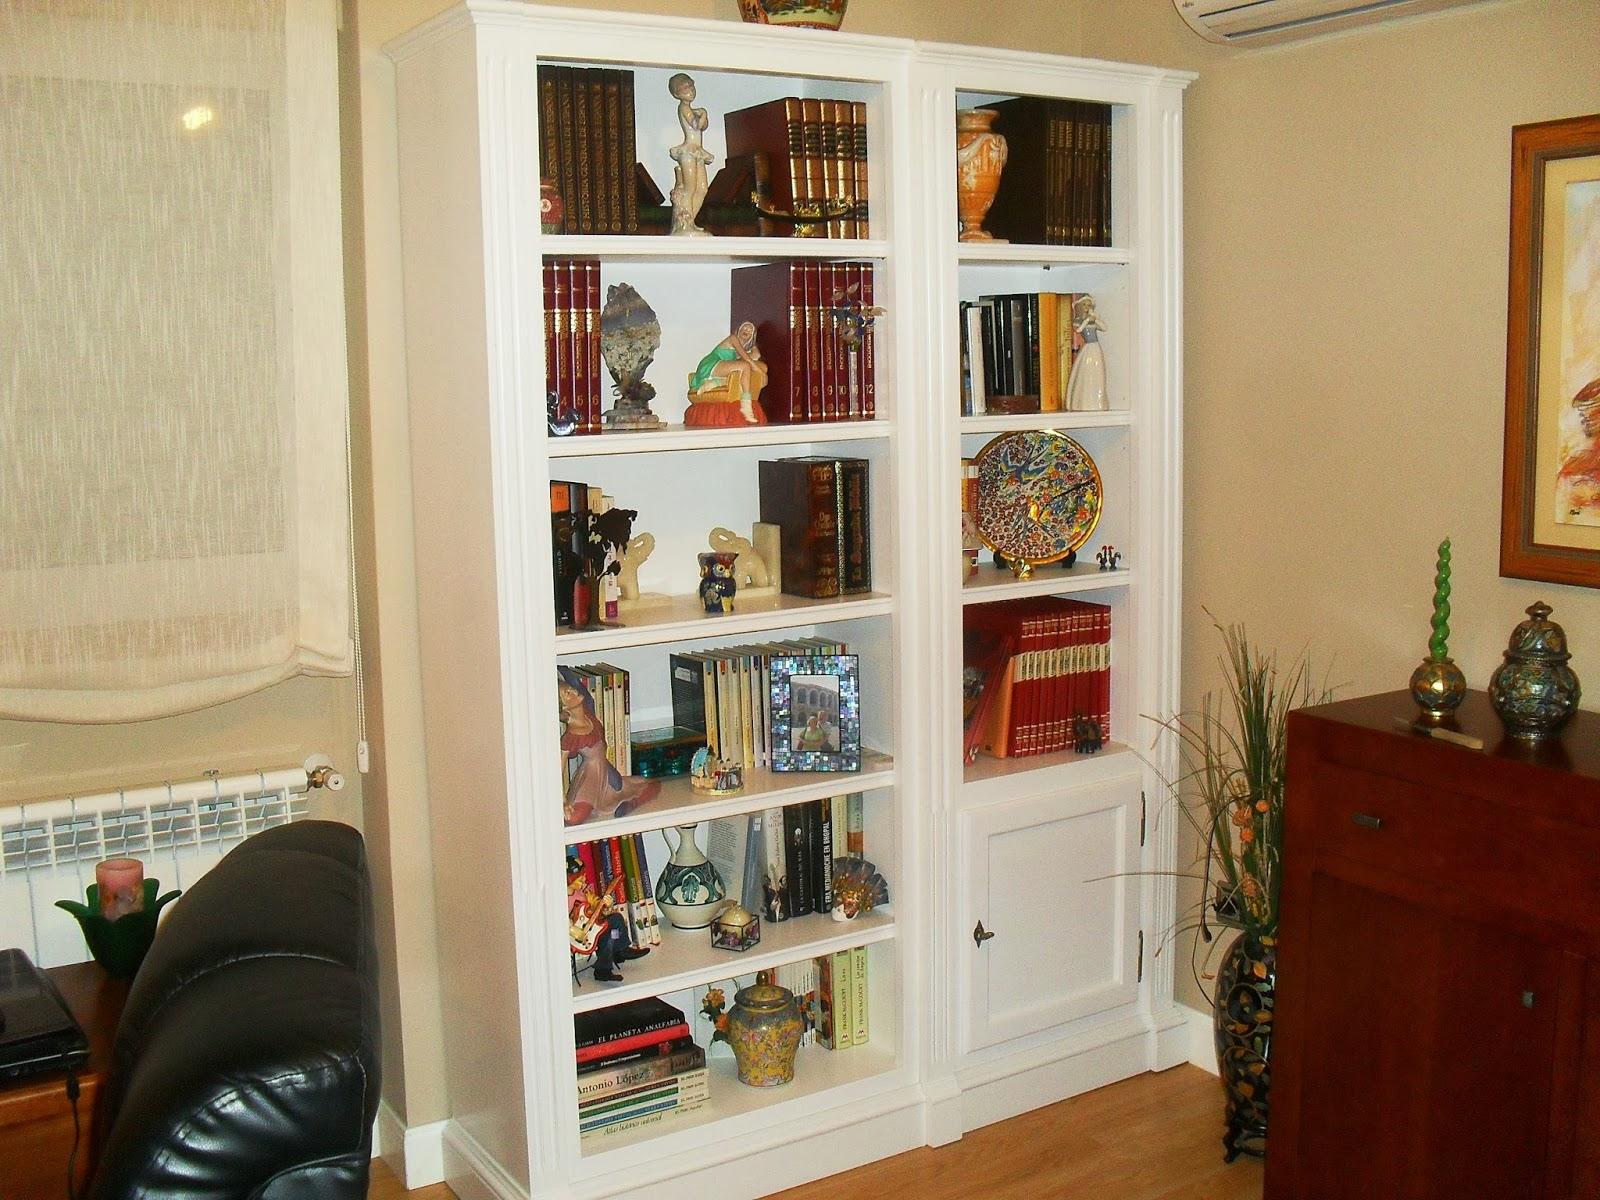 Librerias a medida madrid librerias lacadas de calidad - Librerias lacadas ...